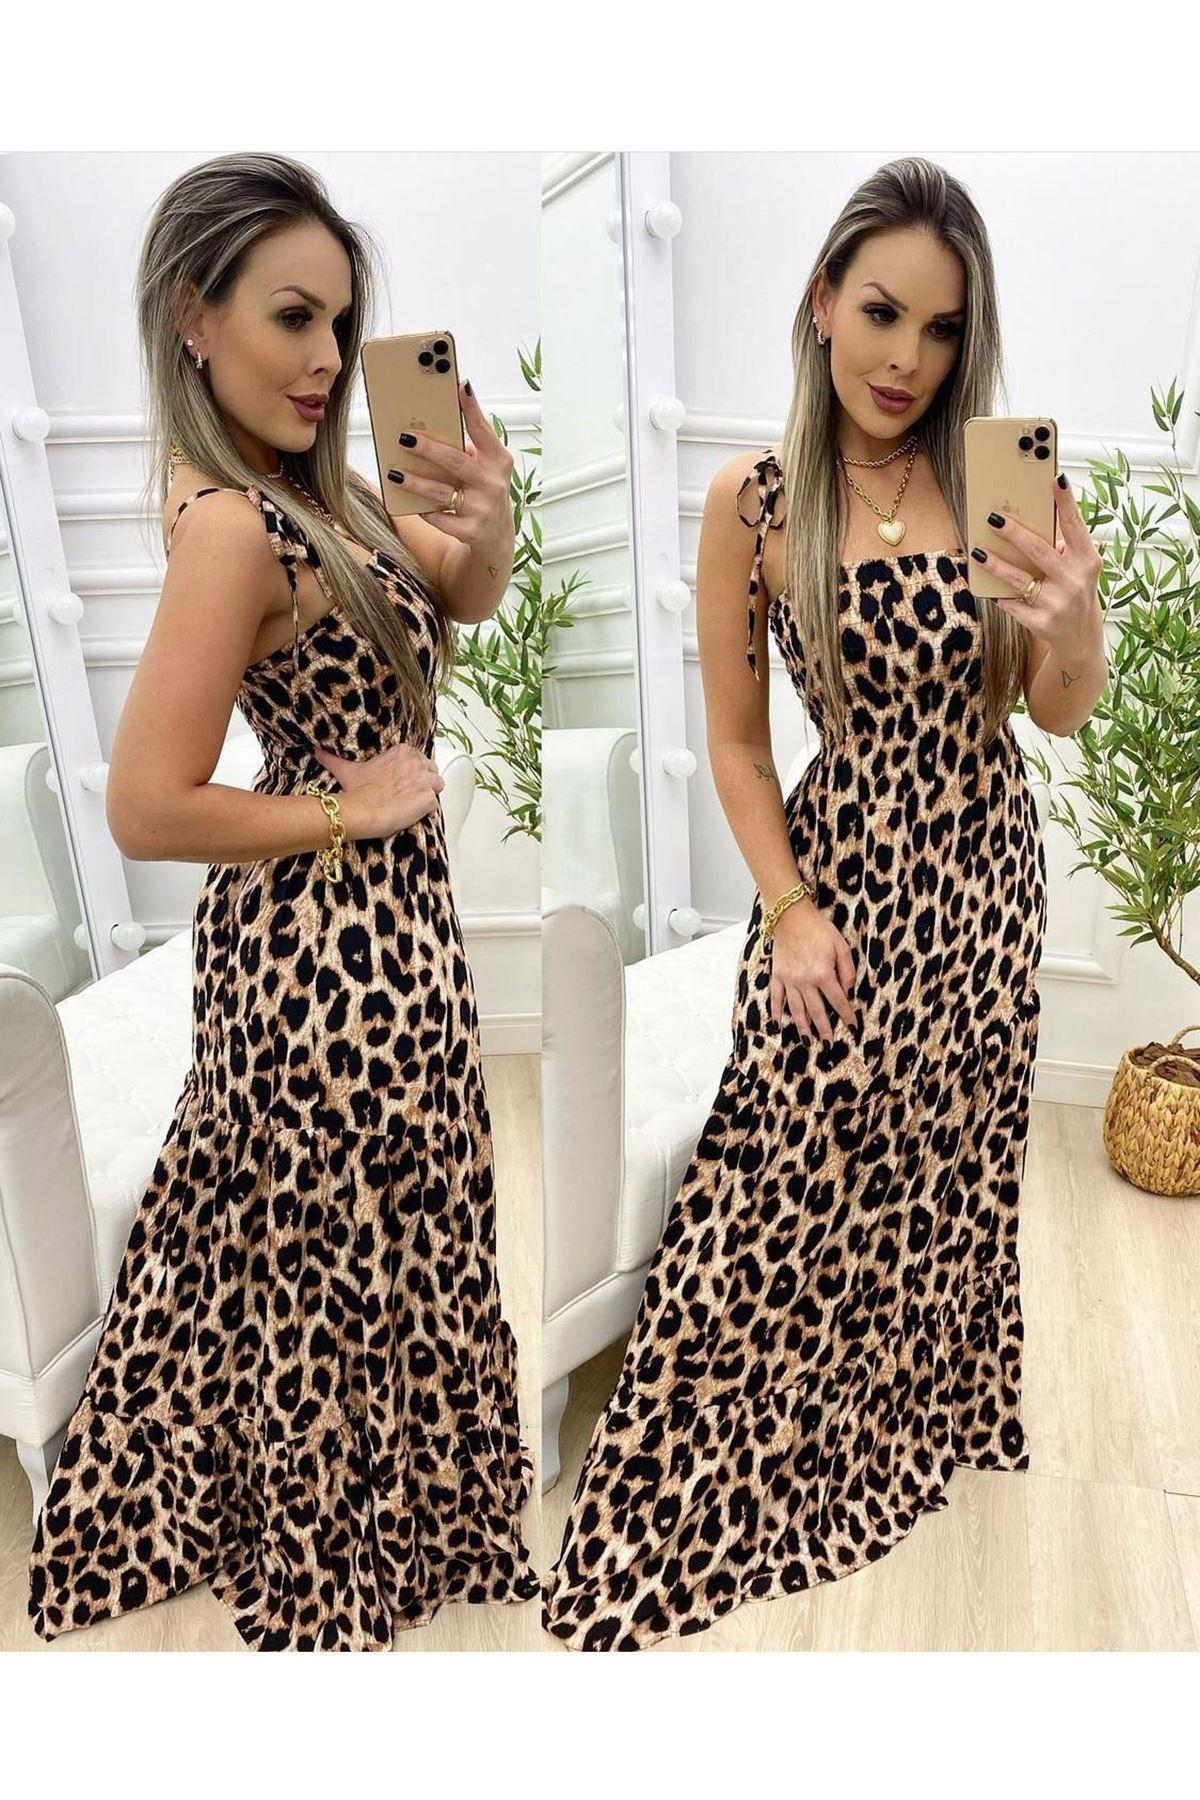 Leopar Desen Askılı Maxi Elbise - LEOPAR